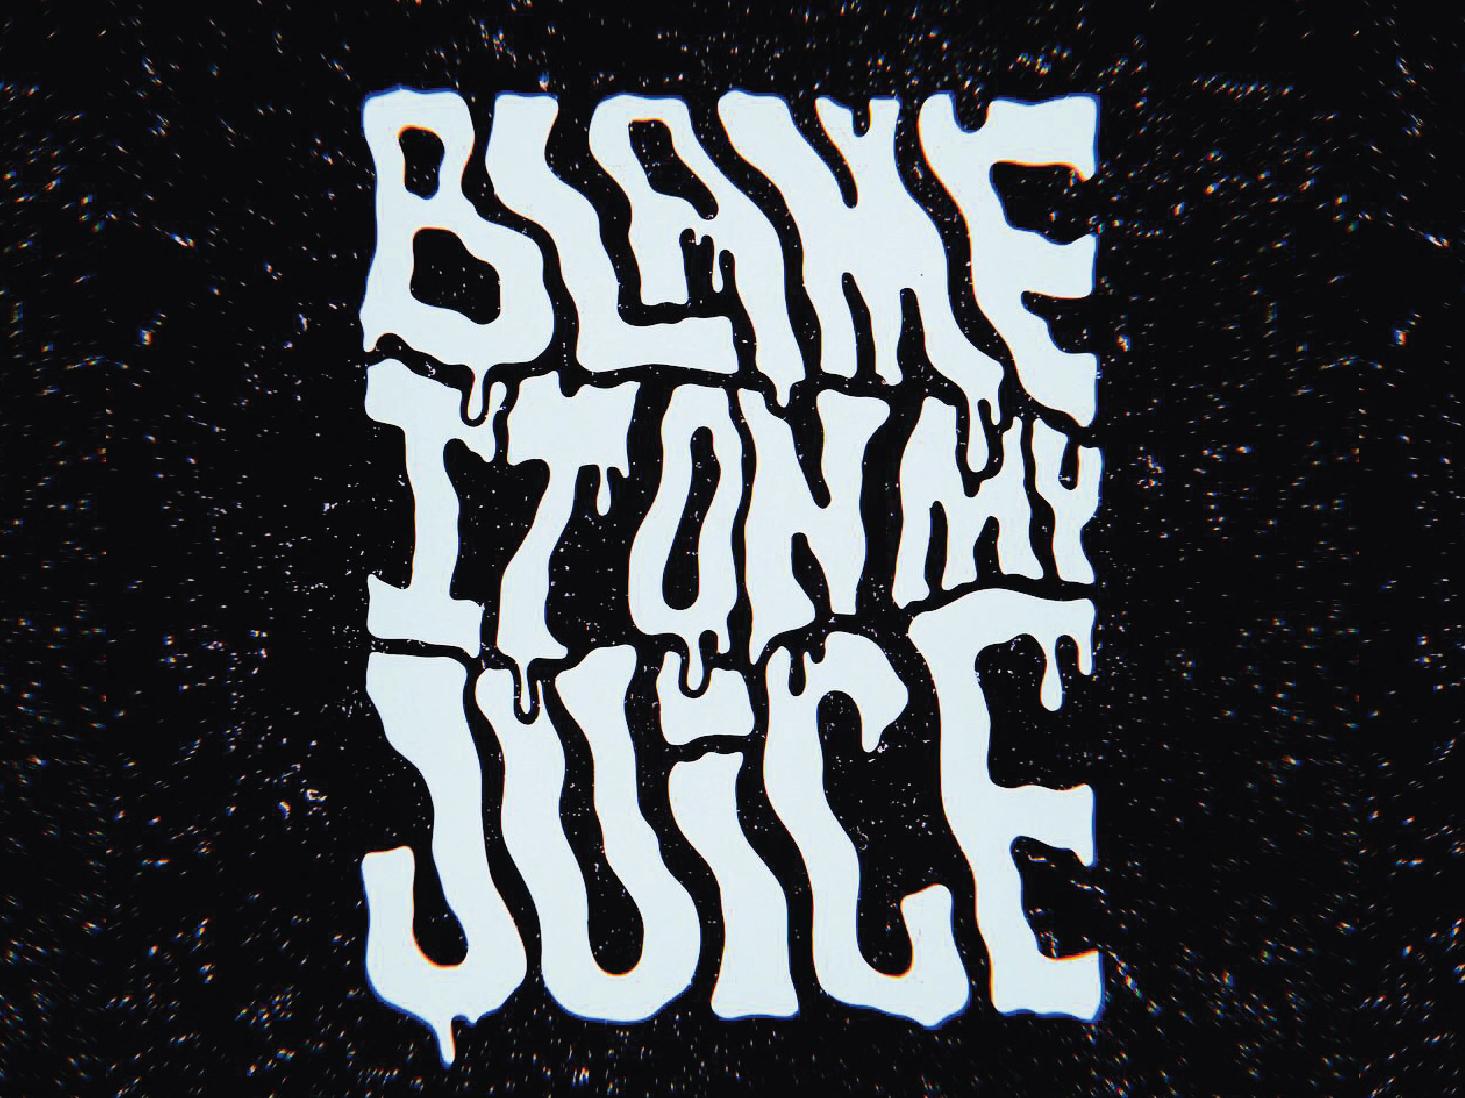 Blame it on my juice, blame it blame it on my juice! texture juice lizzo trippy lyrics music handletter black and white handmade illustrator typography handlettering lettering illustration